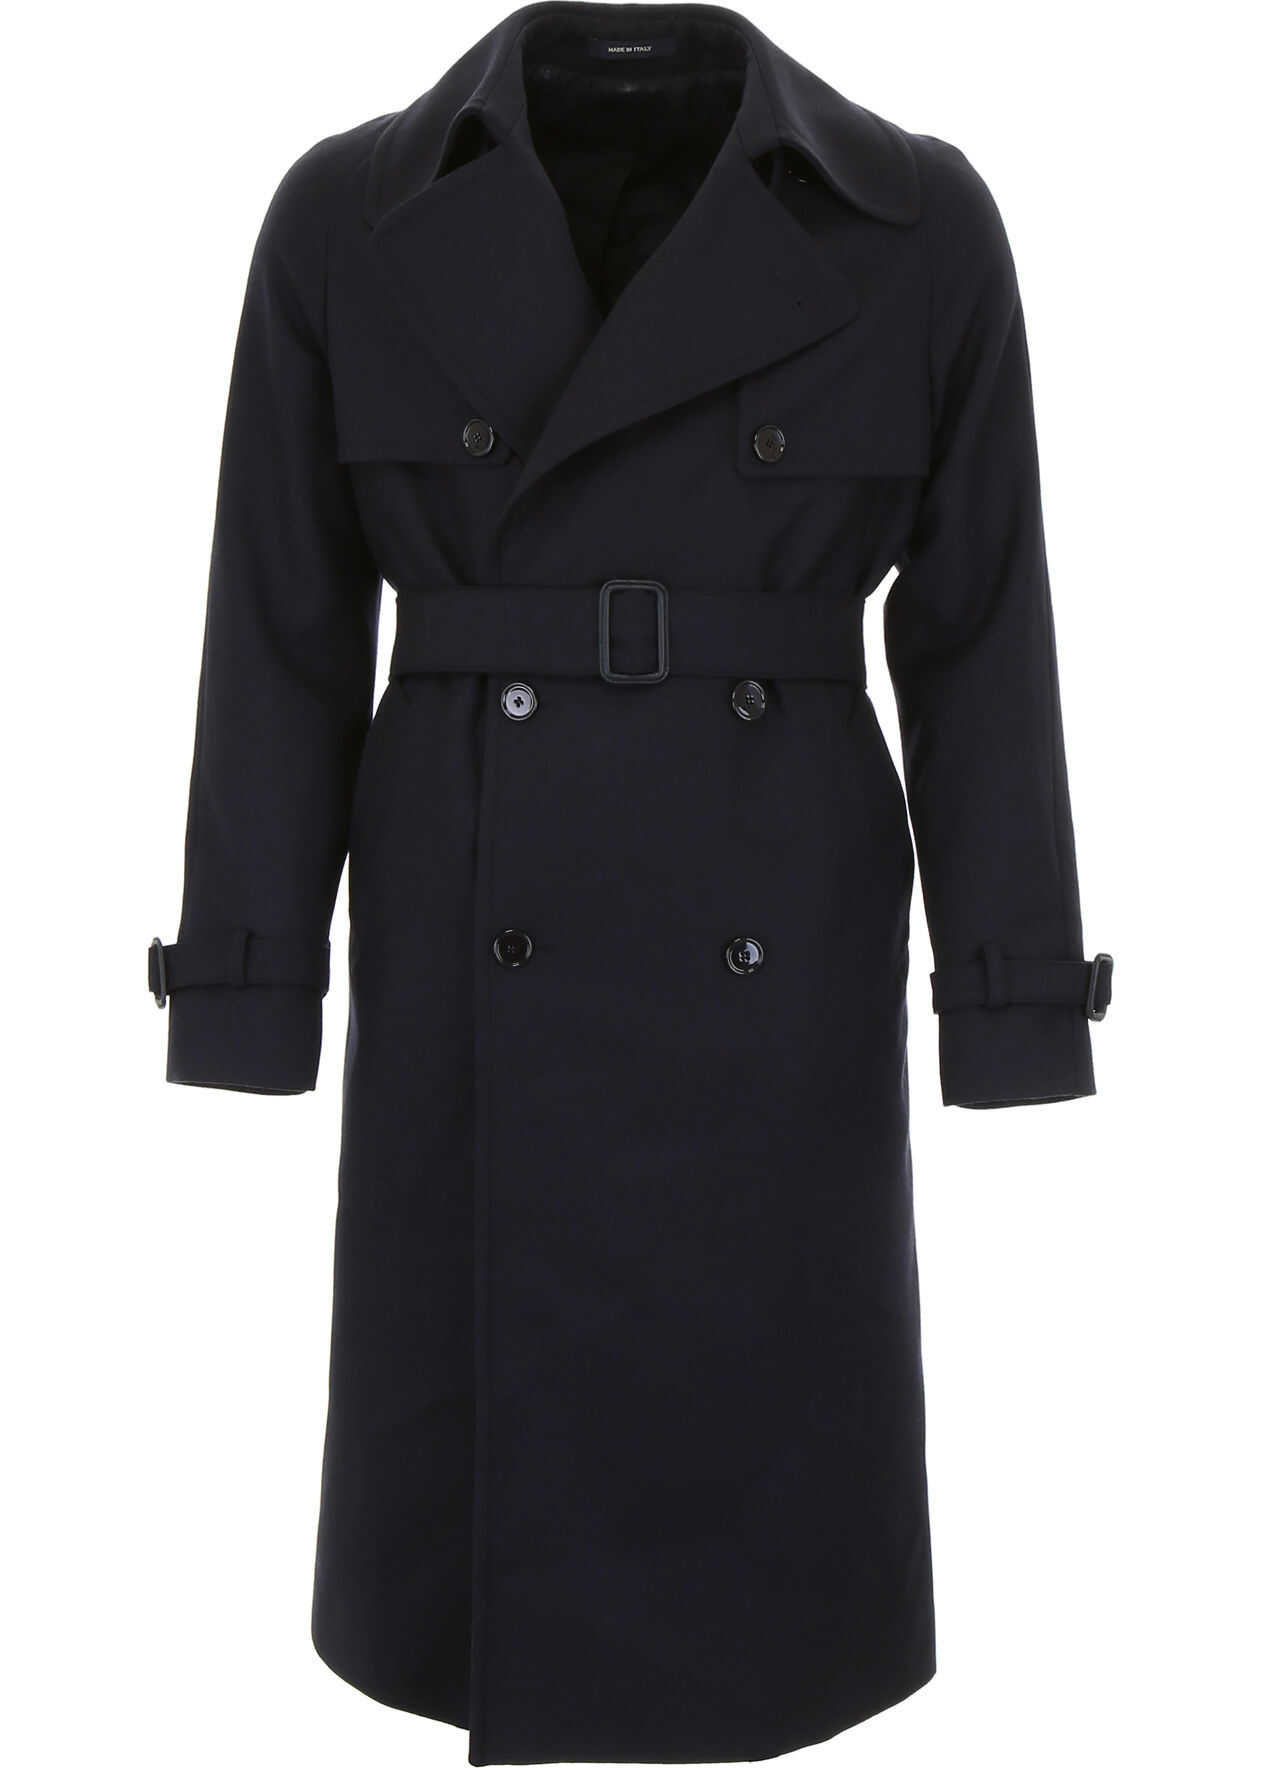 Tagliatore Austin Coat NAVY